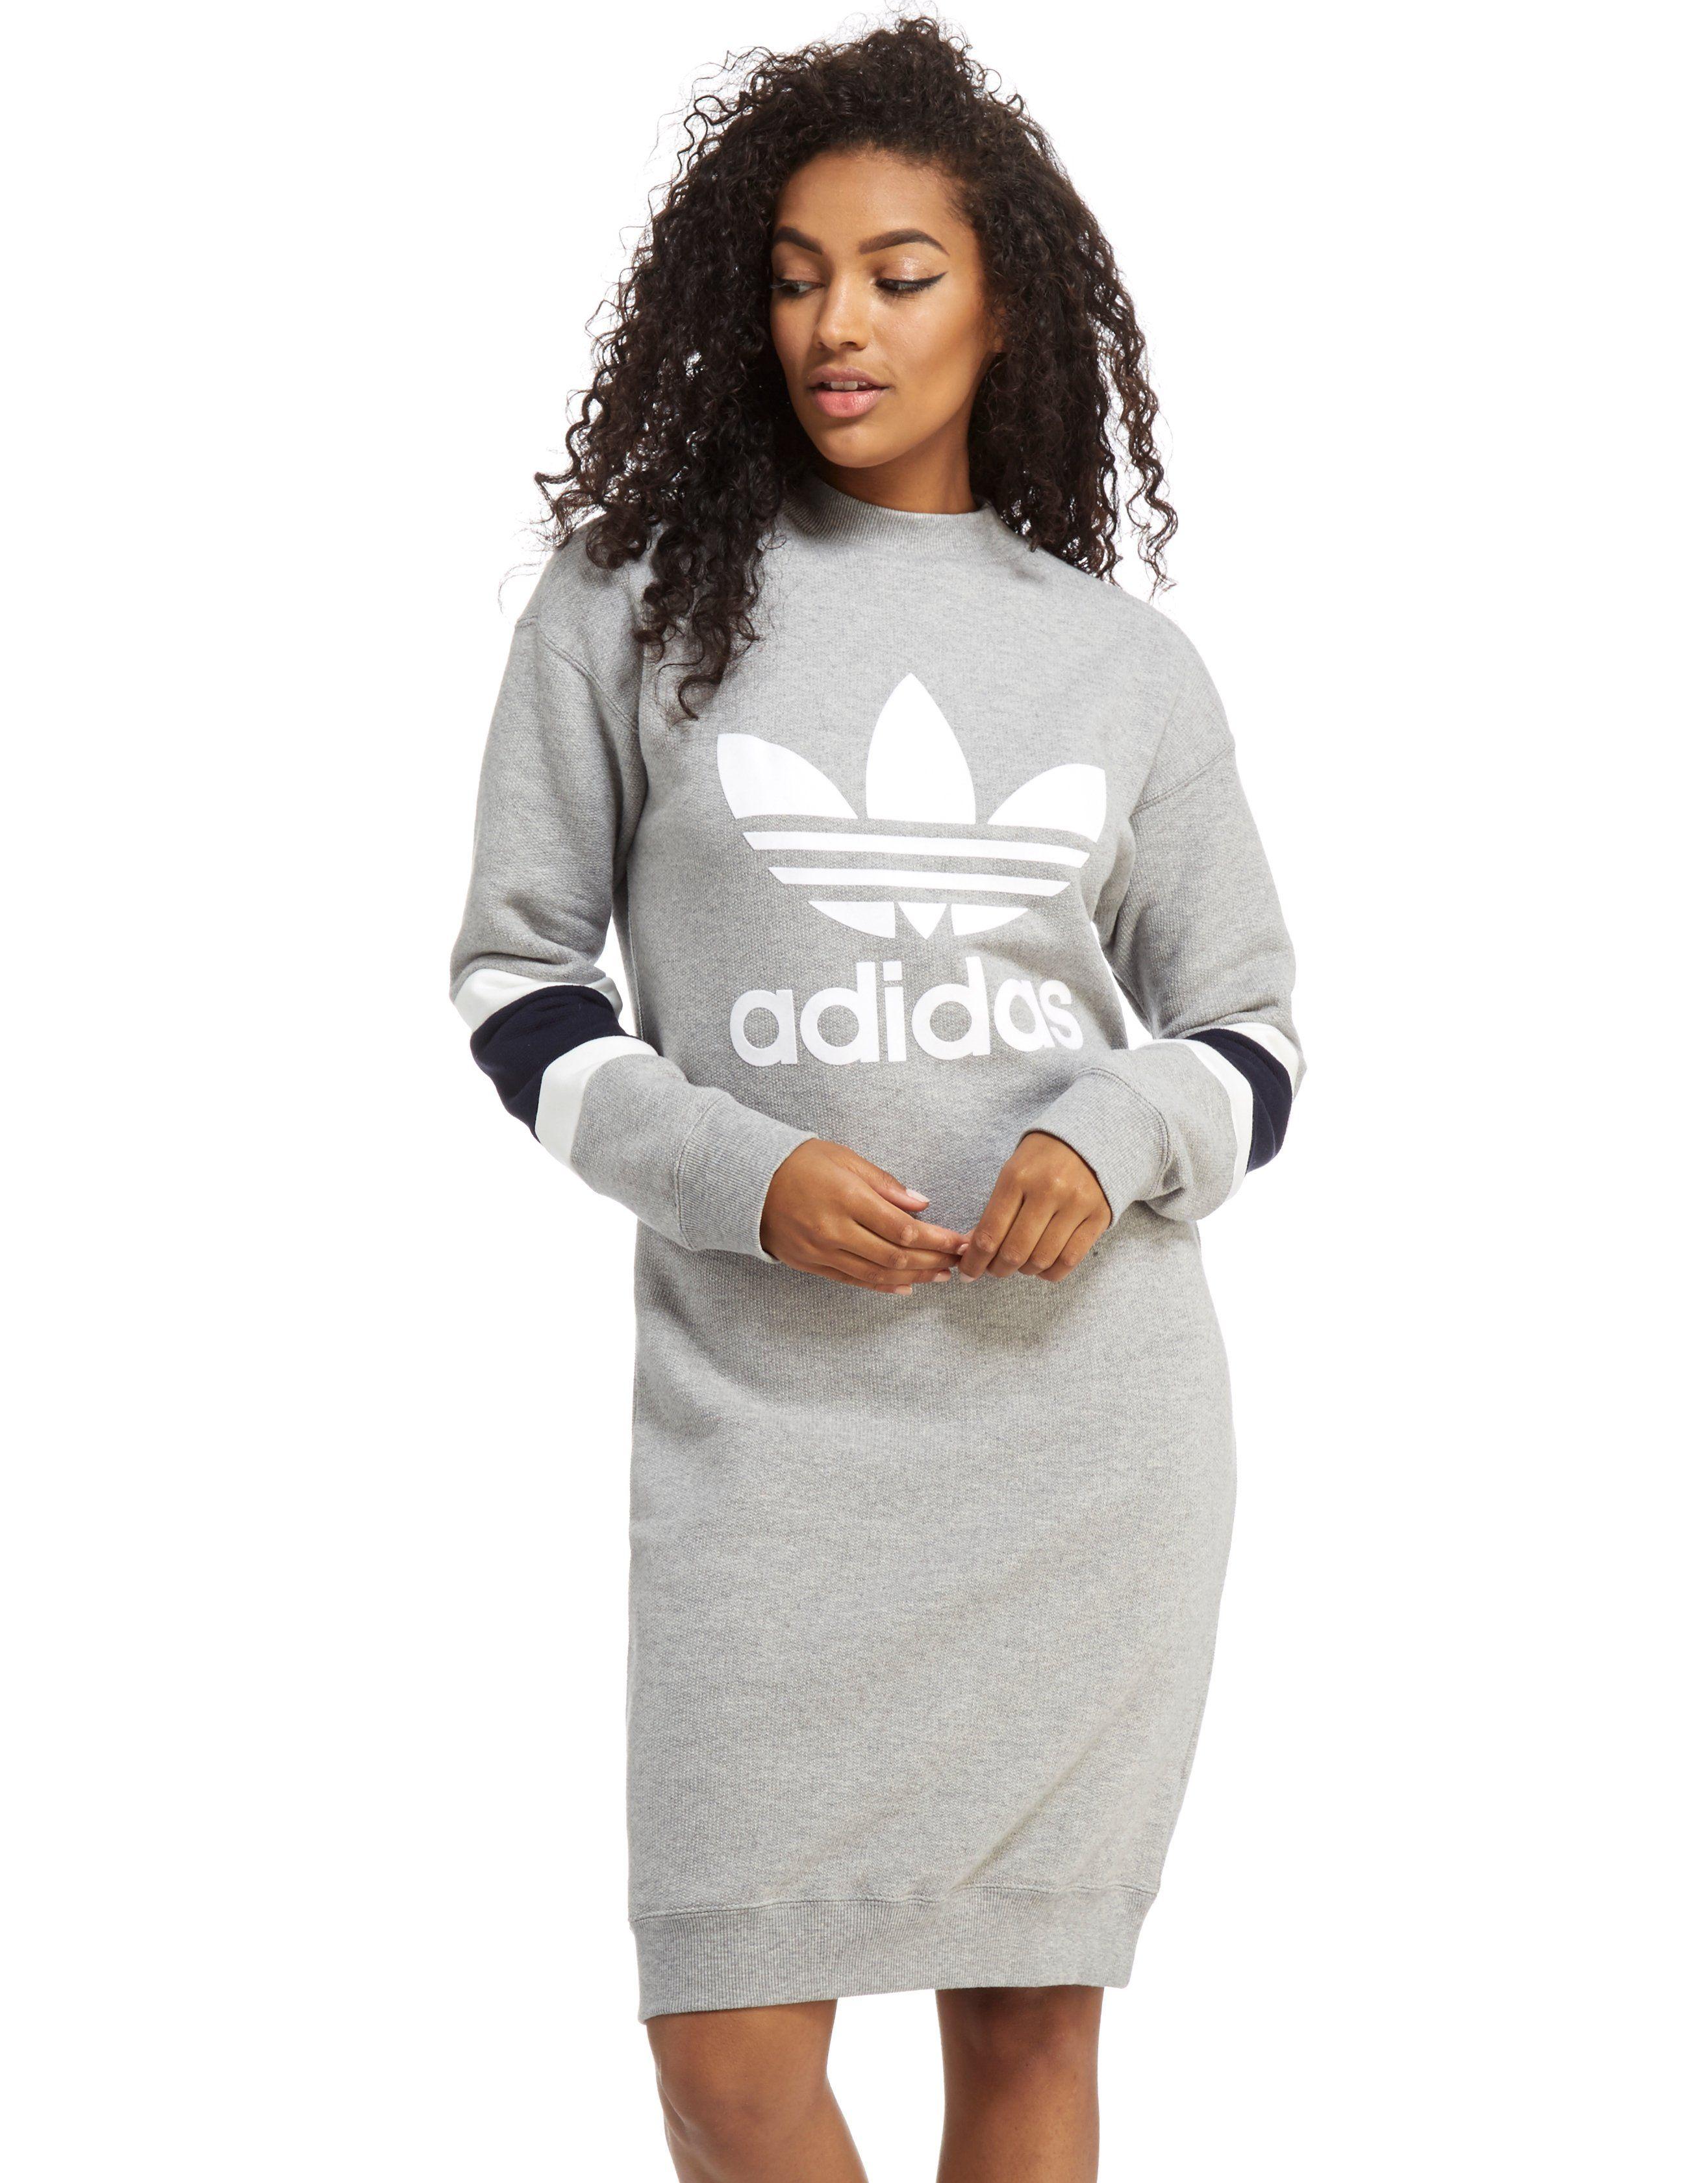 D L Dress co Adidas C uk Sweatshirt RpnxqU0g